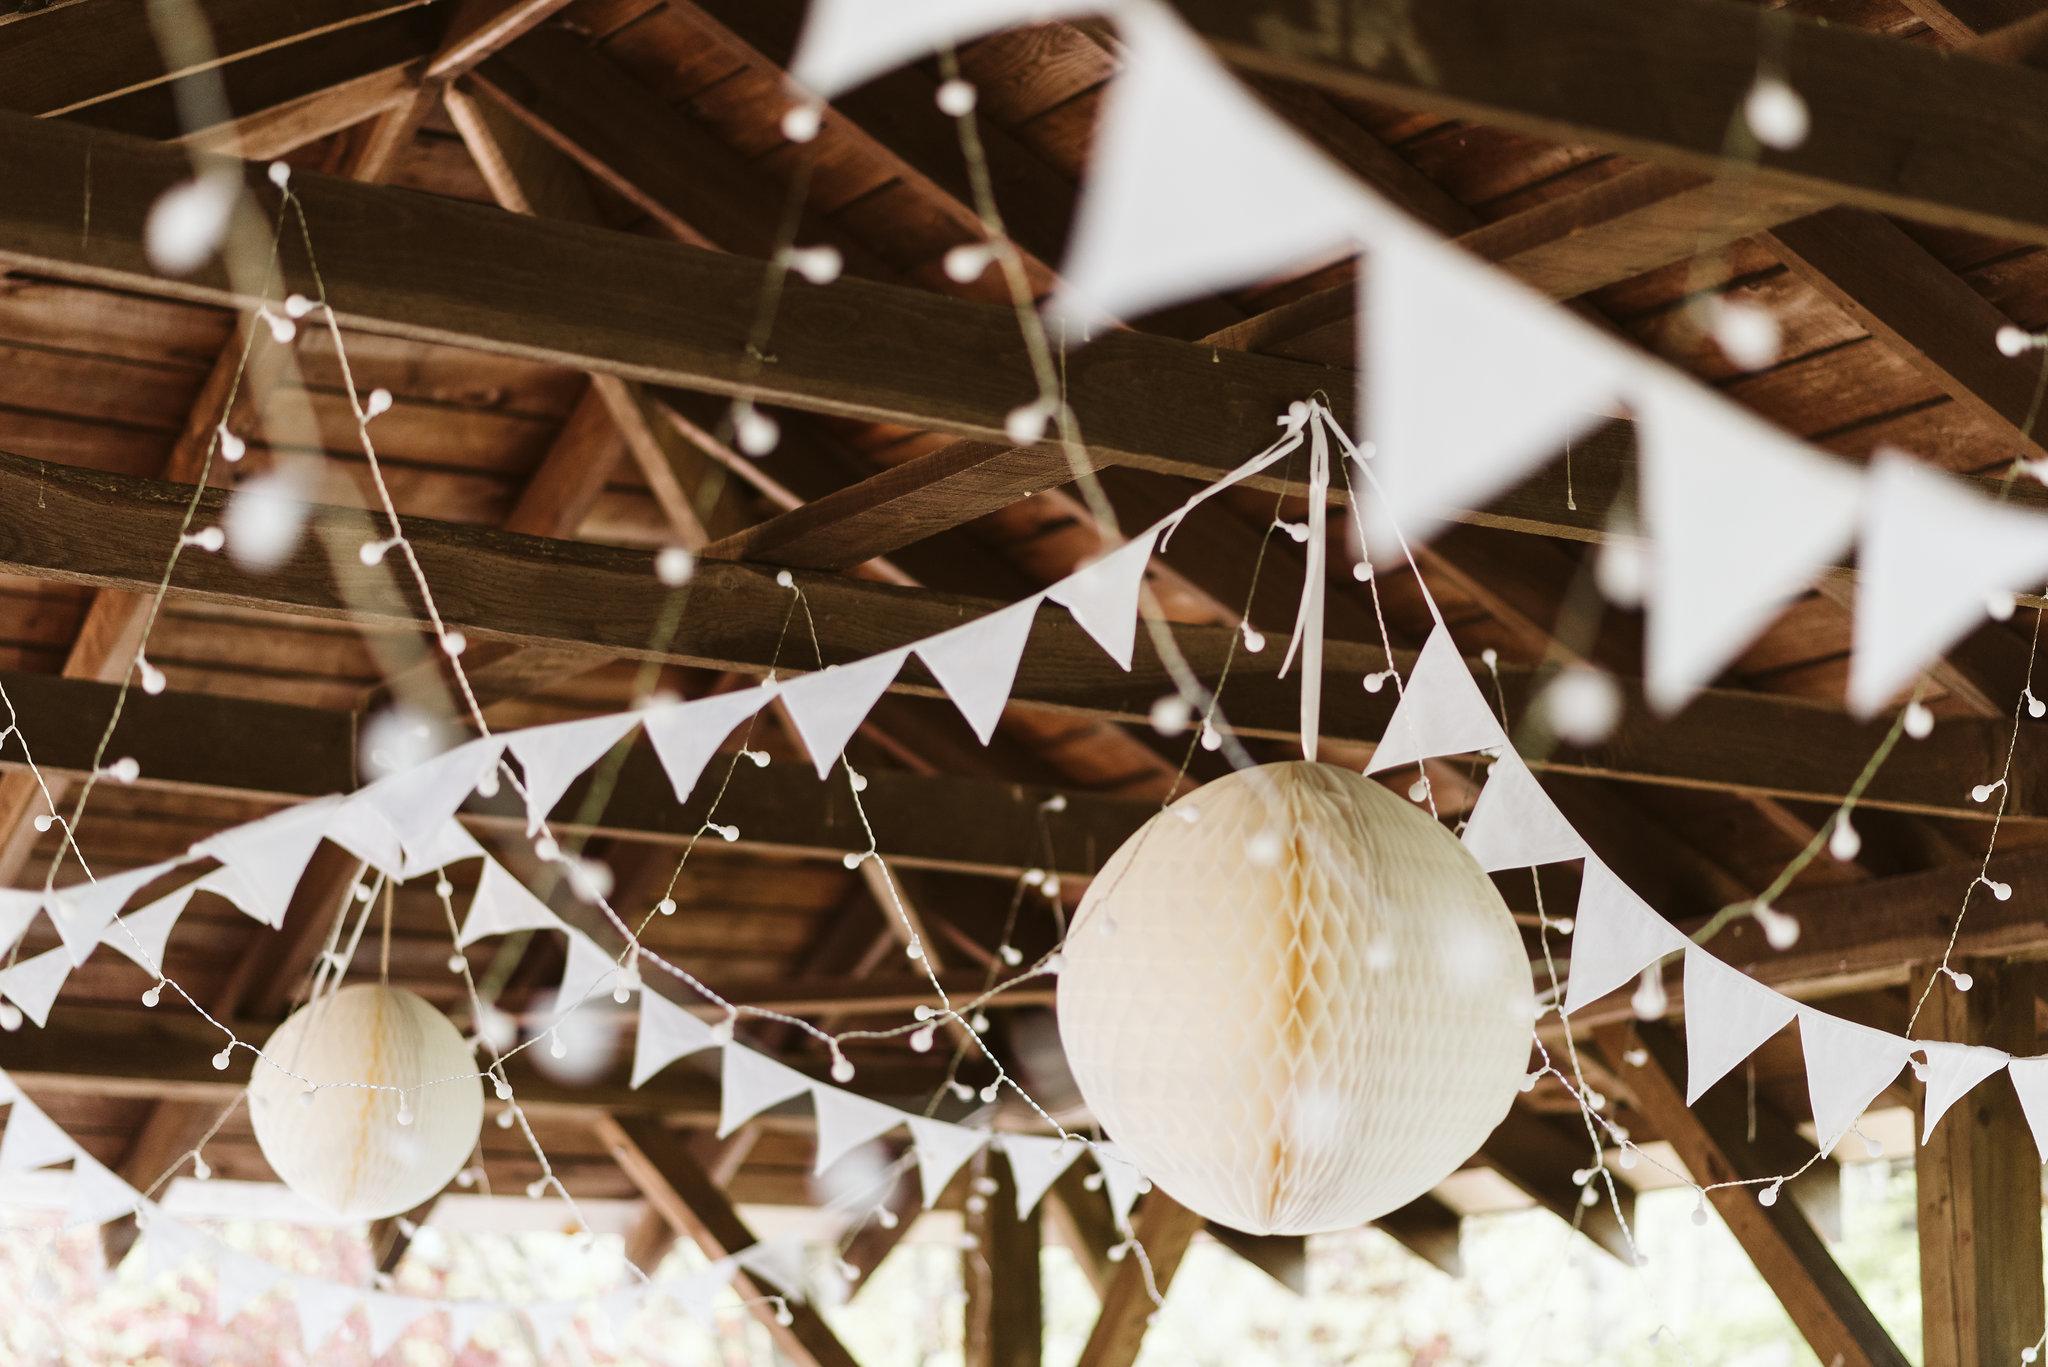 Spring Outdoor Wedding, Park, Baltimore Wedding Photographer, DIY, Classic, Upcycled, Garden Party, Romantic,, White Bunting, Decor